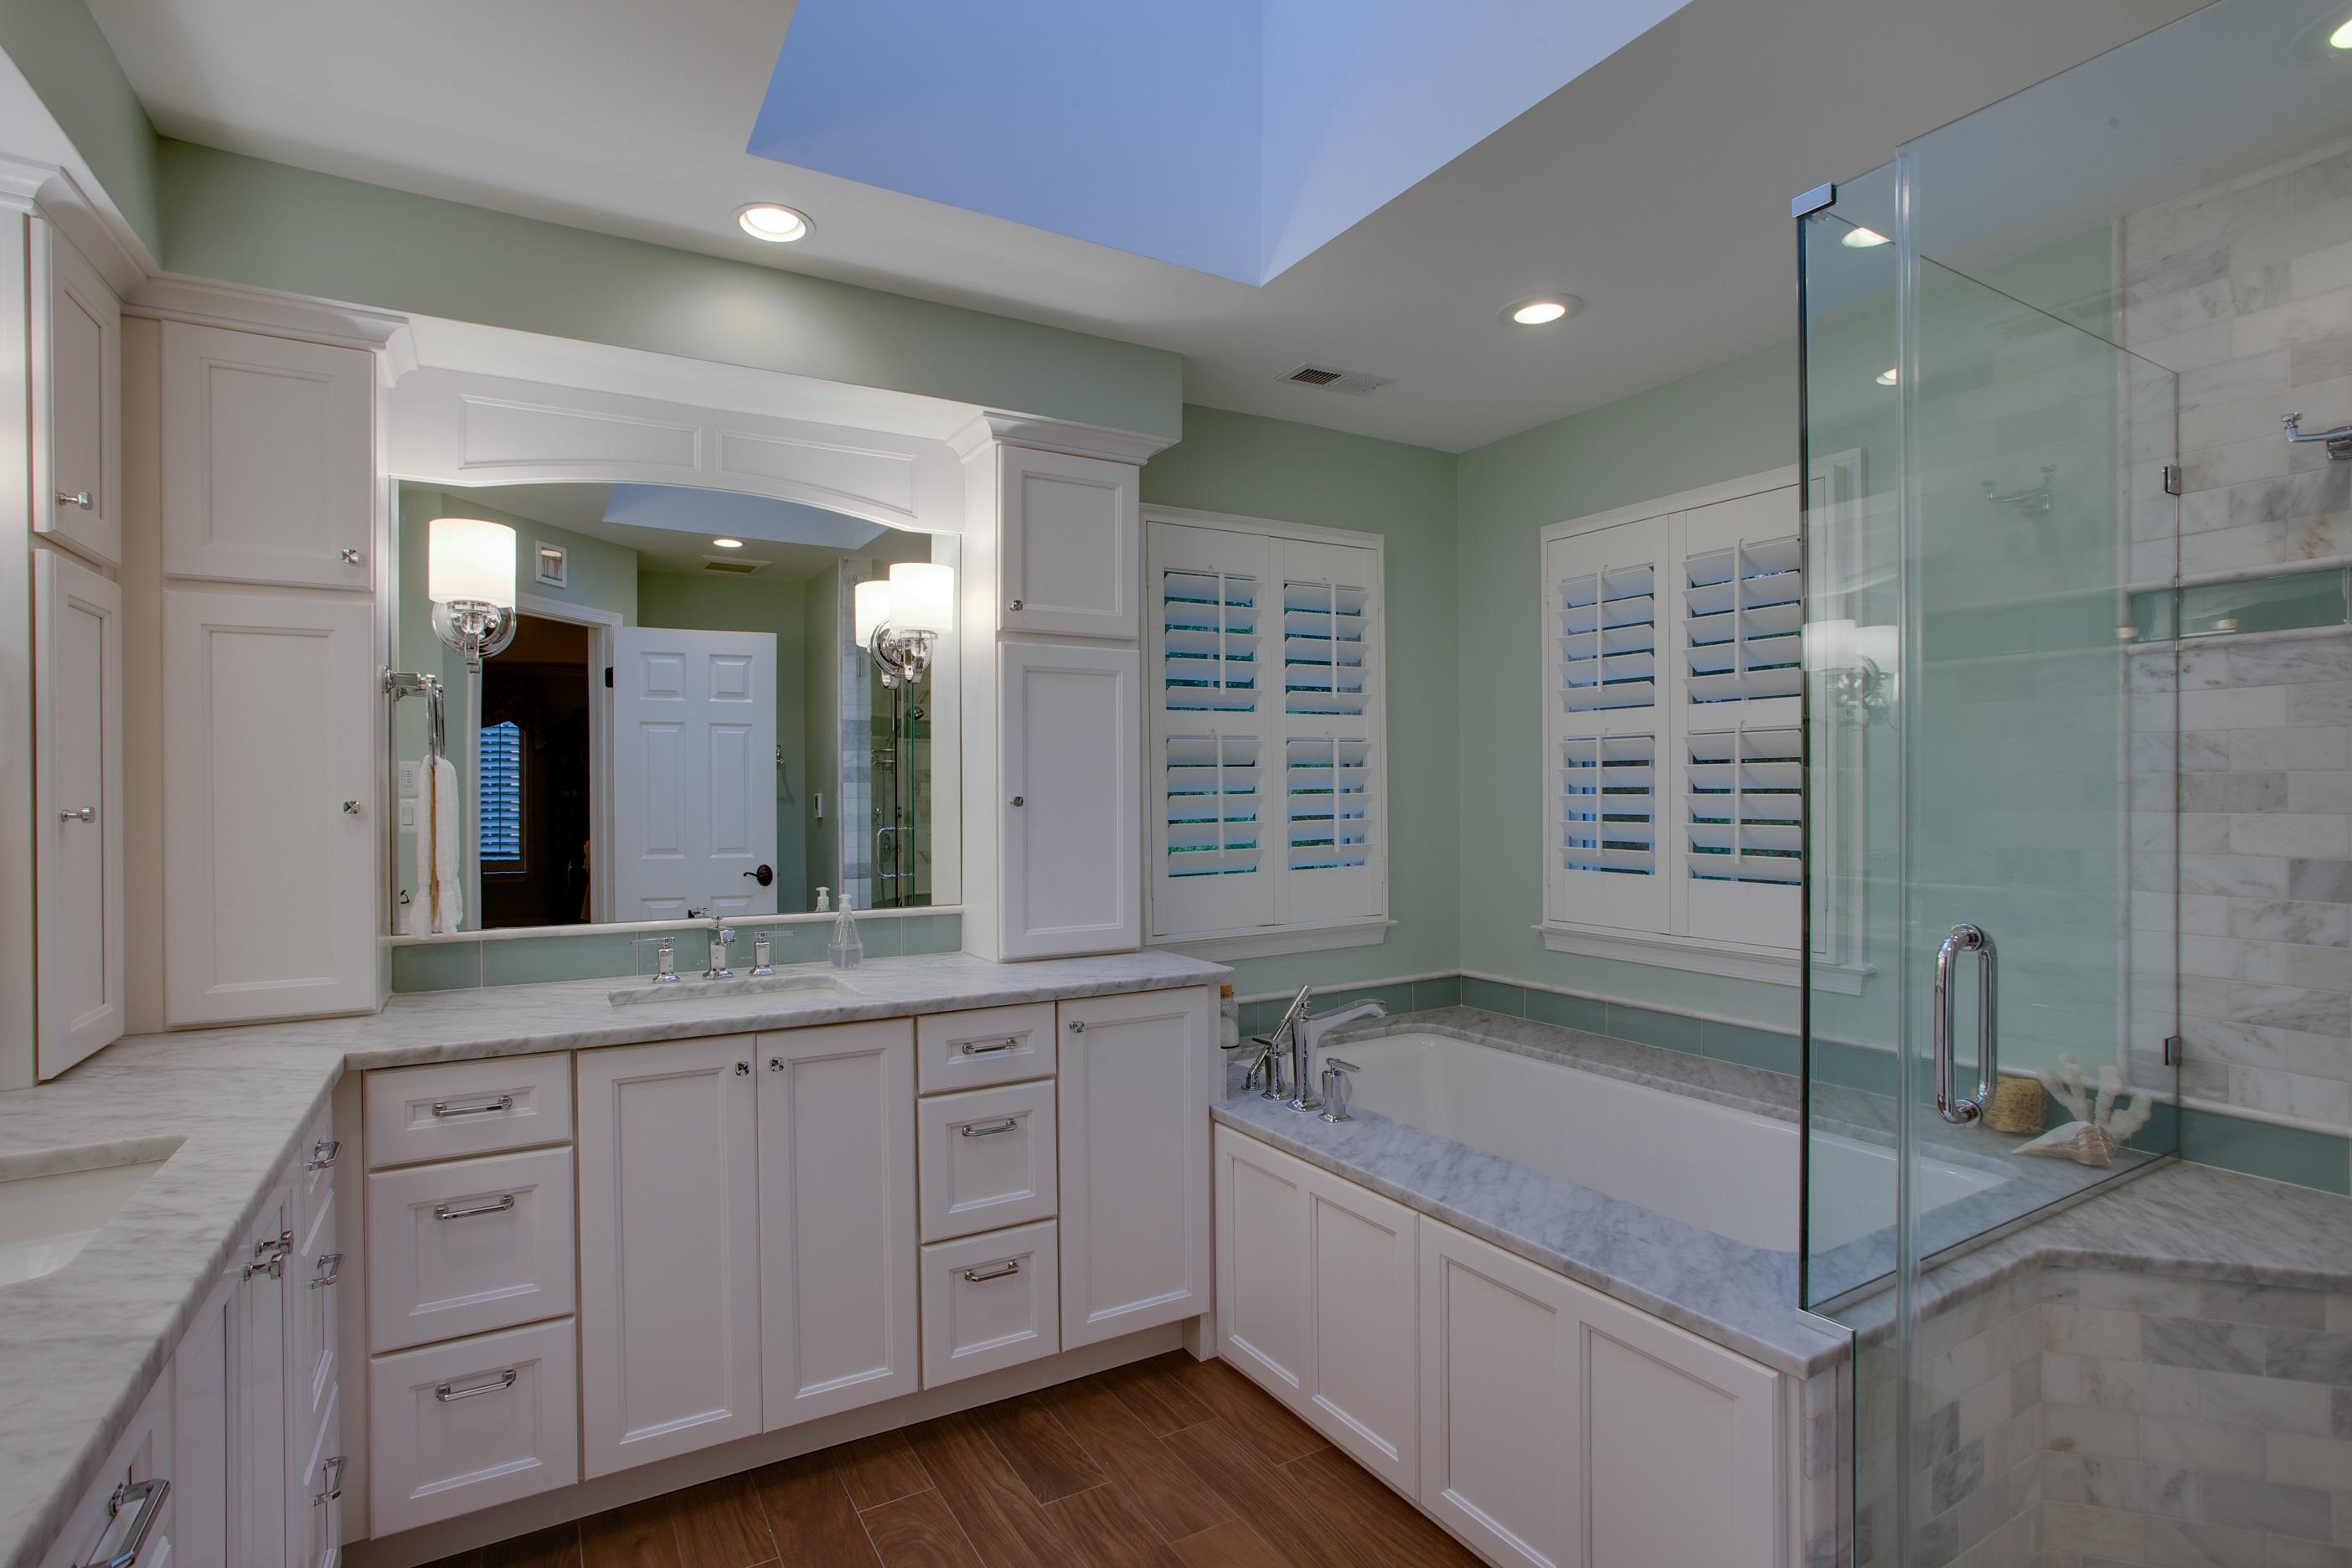 Bathroom Renovation Northern Virginia Let Us Help You